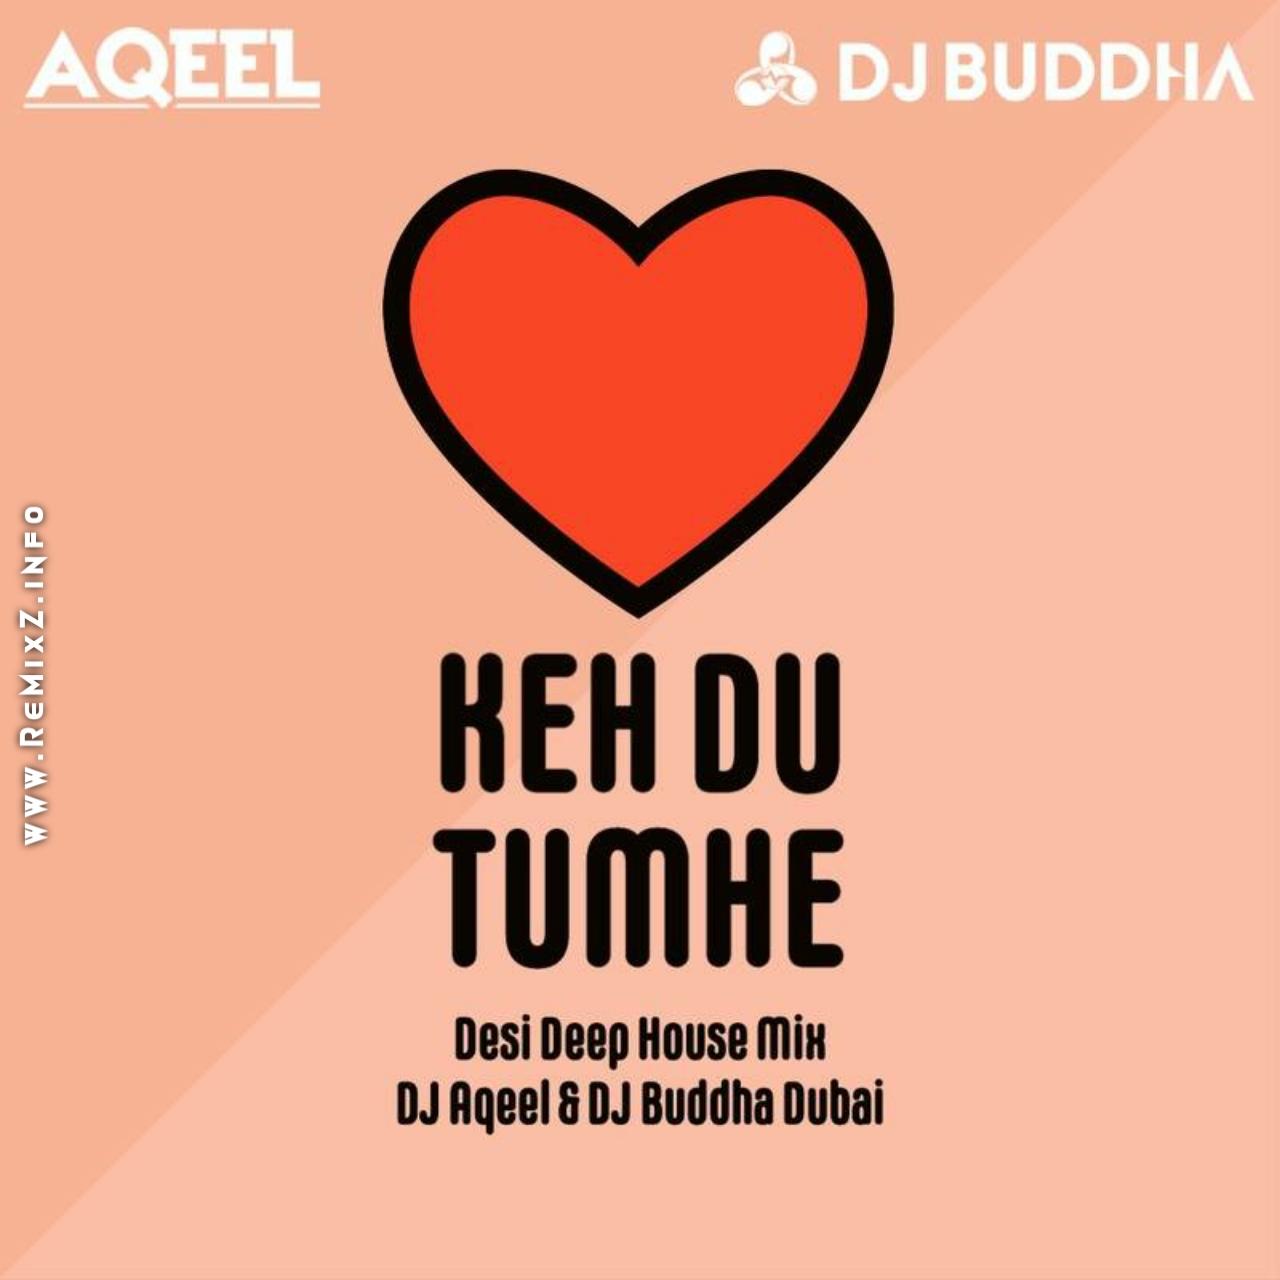 keh-du-tumhe-desi-deep-house-mix.jpg